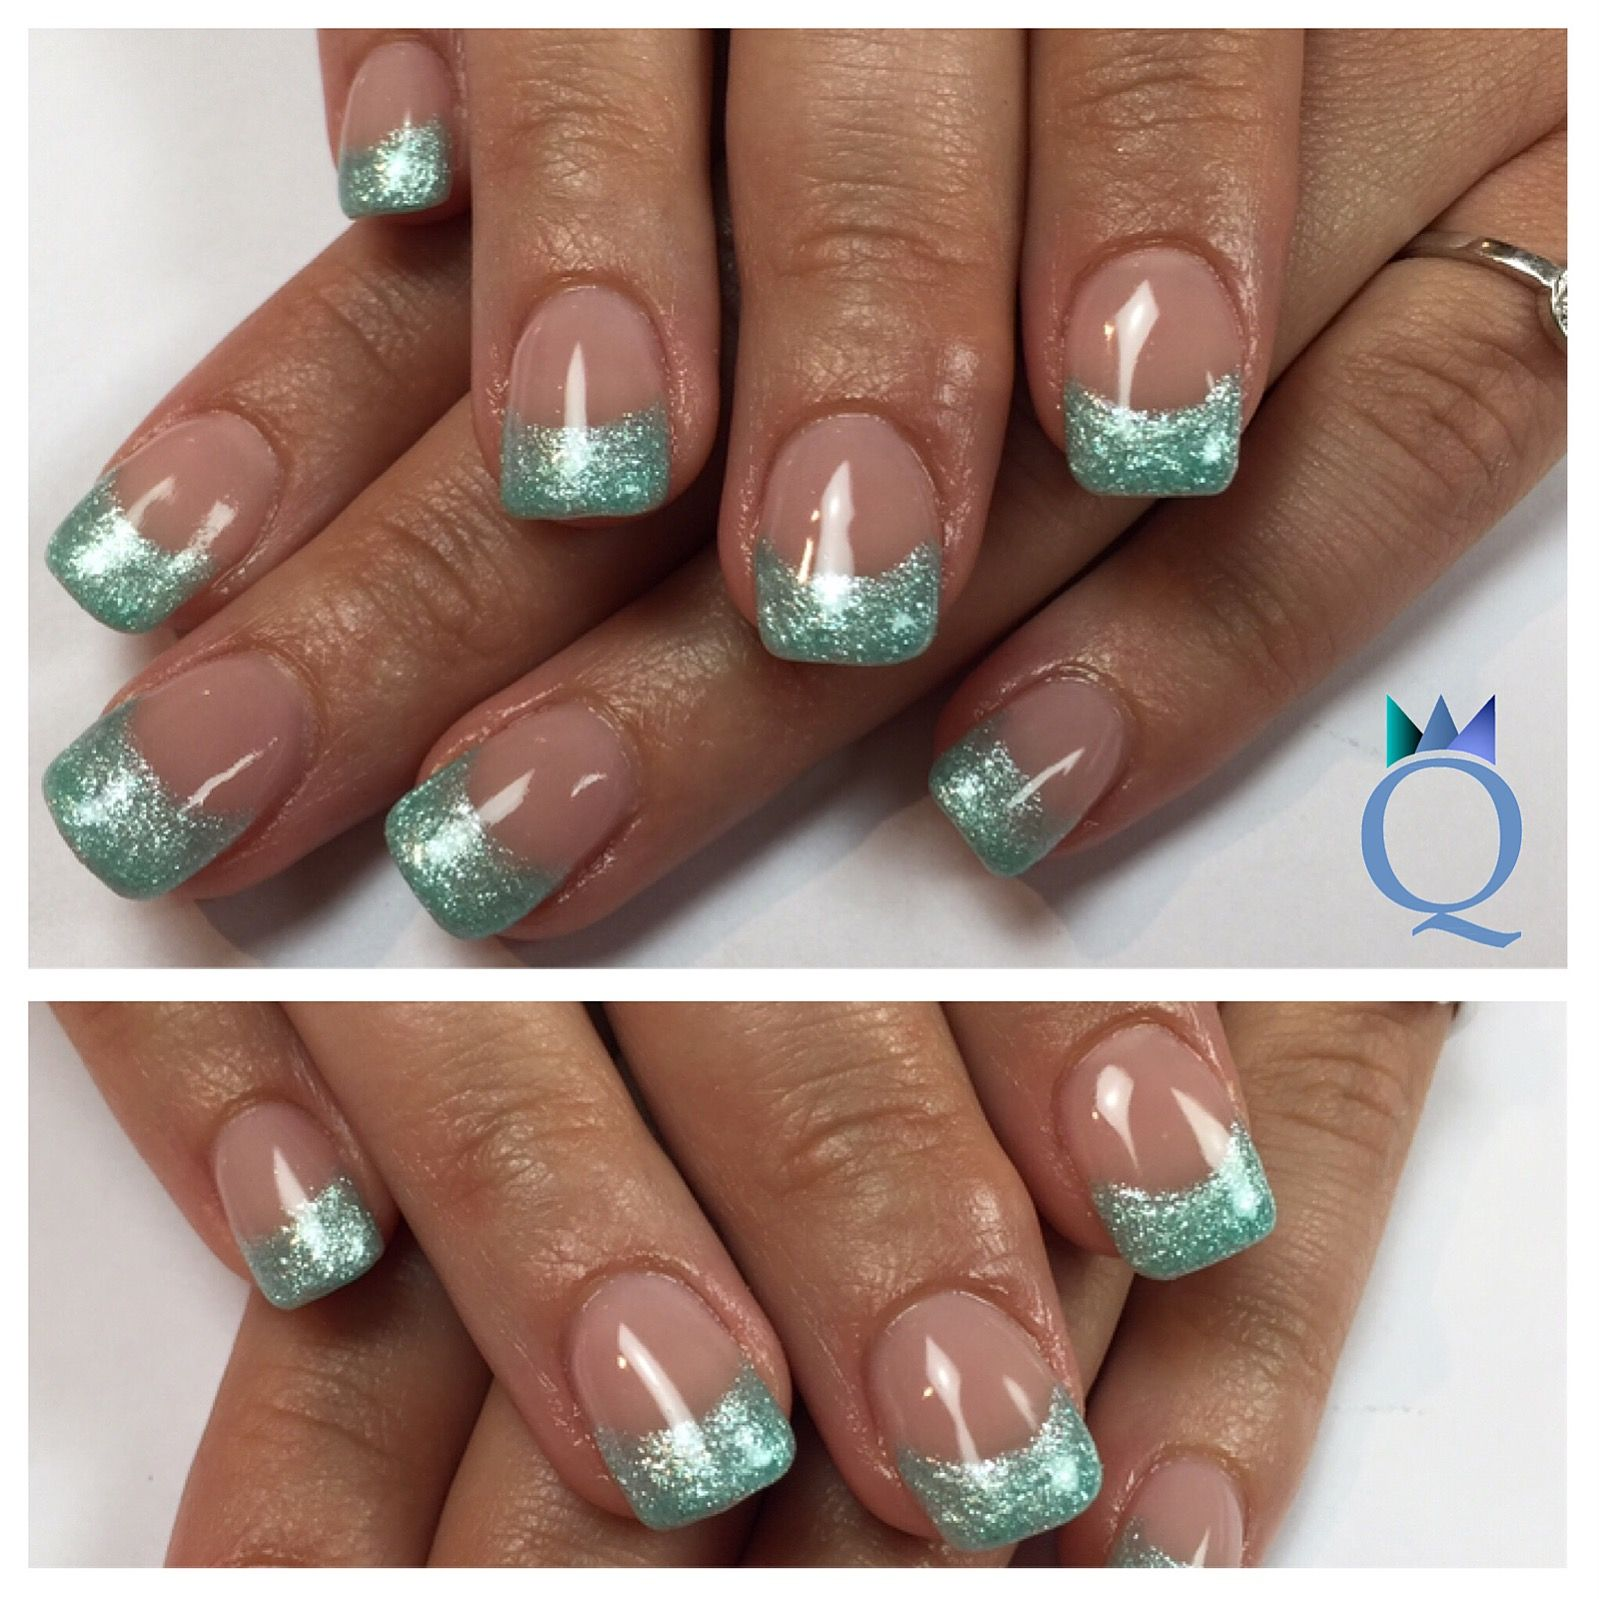 gelnails nails frenchnails turquoise glitter geln gel n gel french t rkis glitzer. Black Bedroom Furniture Sets. Home Design Ideas